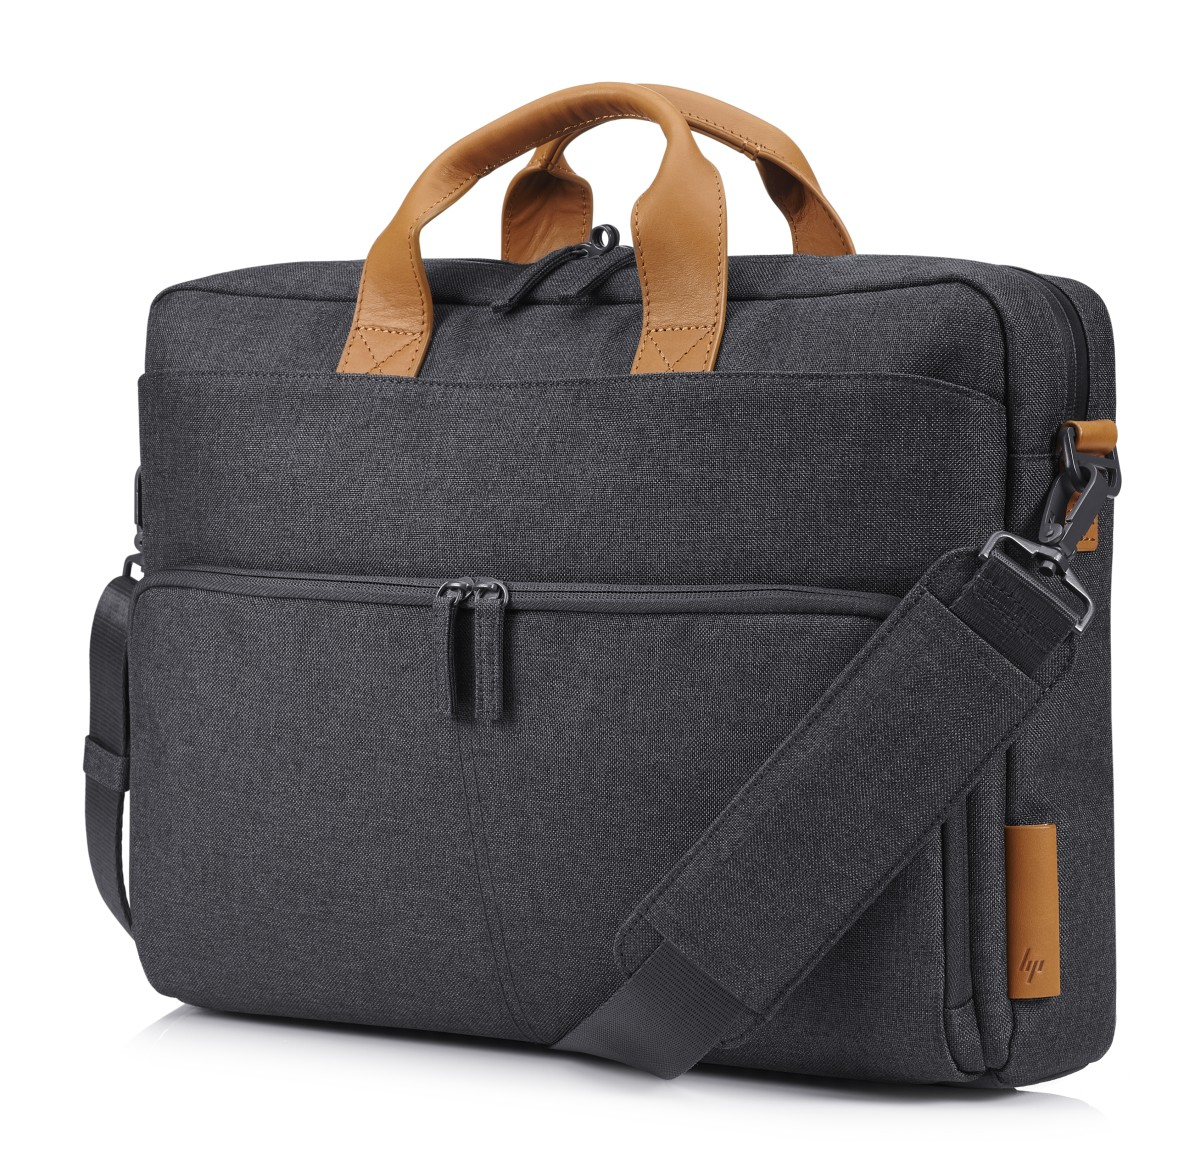 "HP ENVY Urban 15.6 Topload maletines para portátil 39,6 cm (15.6"") Maletín Carbón vegetal, Gris"